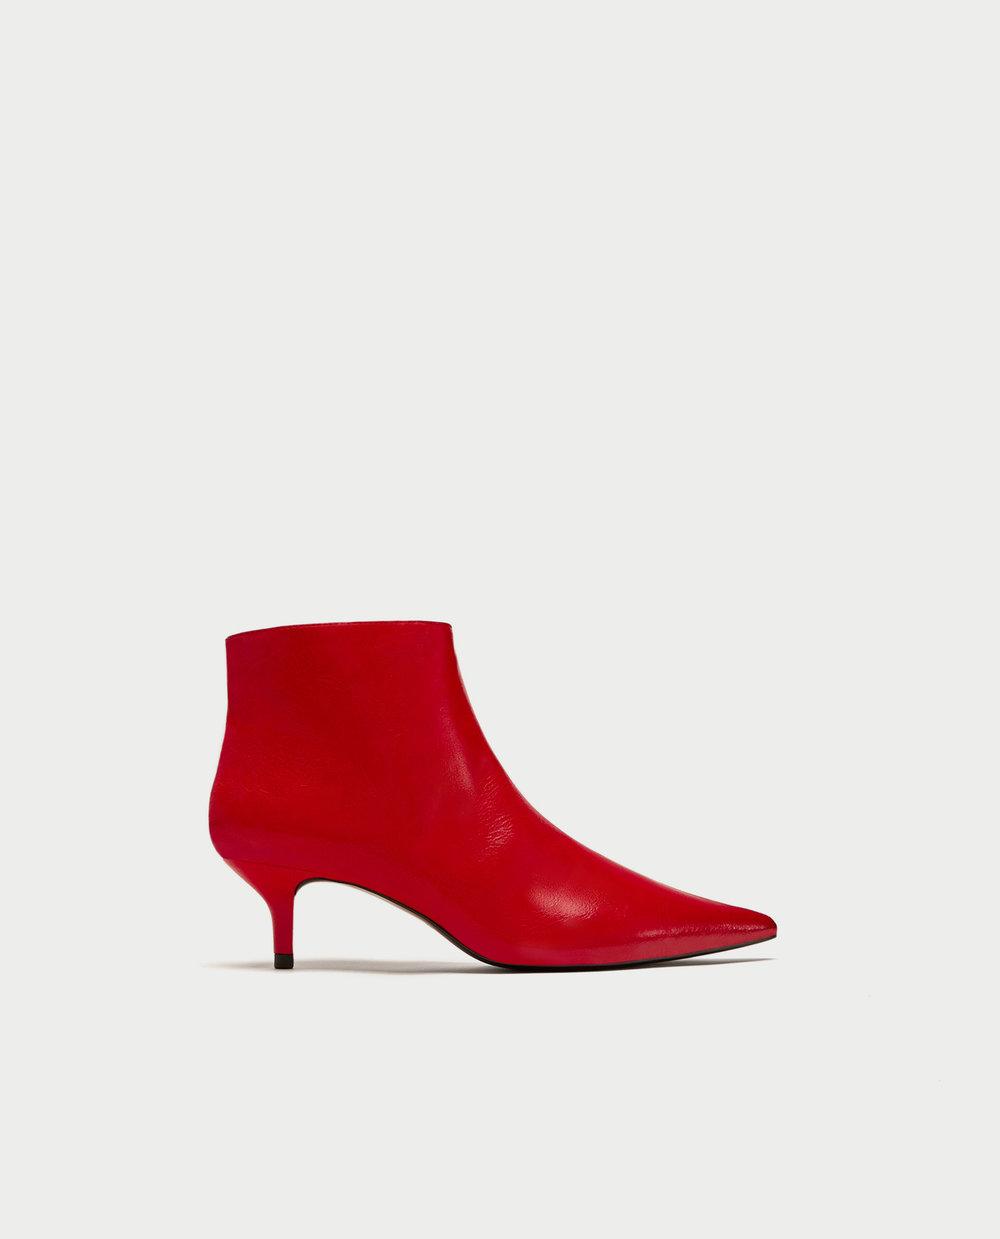 Zara Mid-Heel Ankle Boot, $39.90